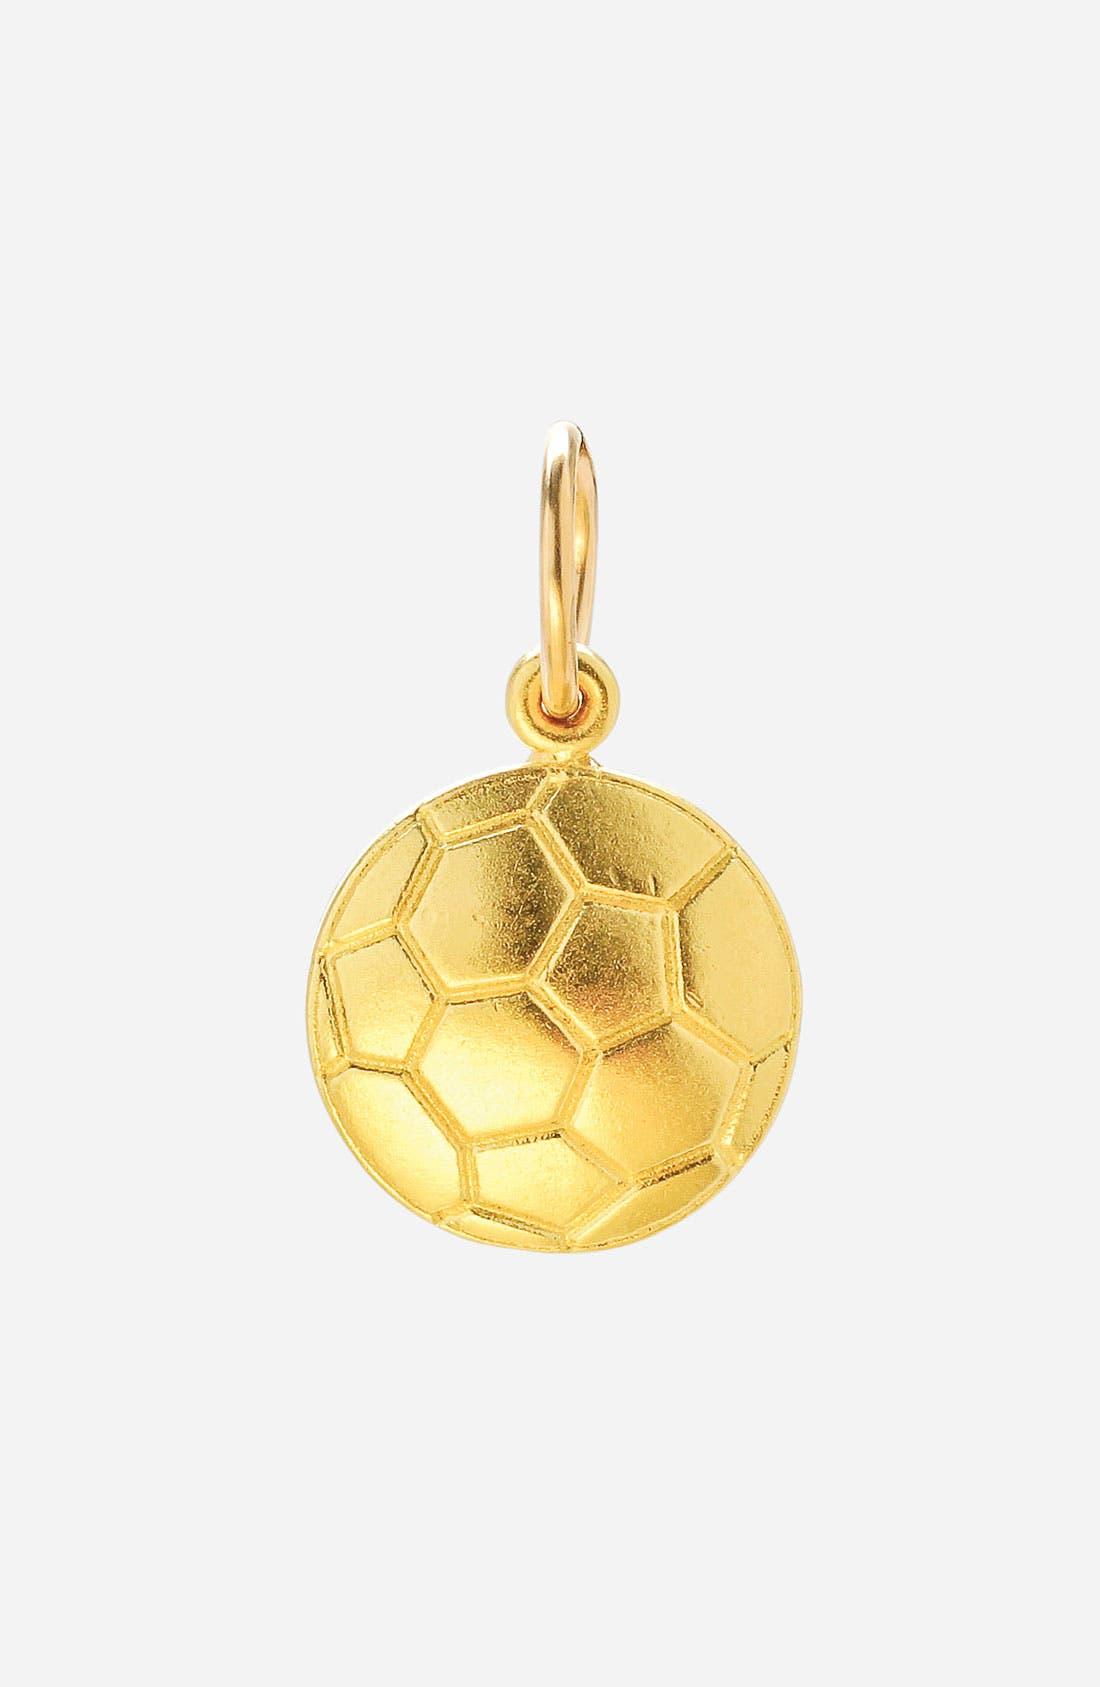 Alternate Image 1 Selected - Dogeared 'Create - Hobby' Soccer Ball Charm